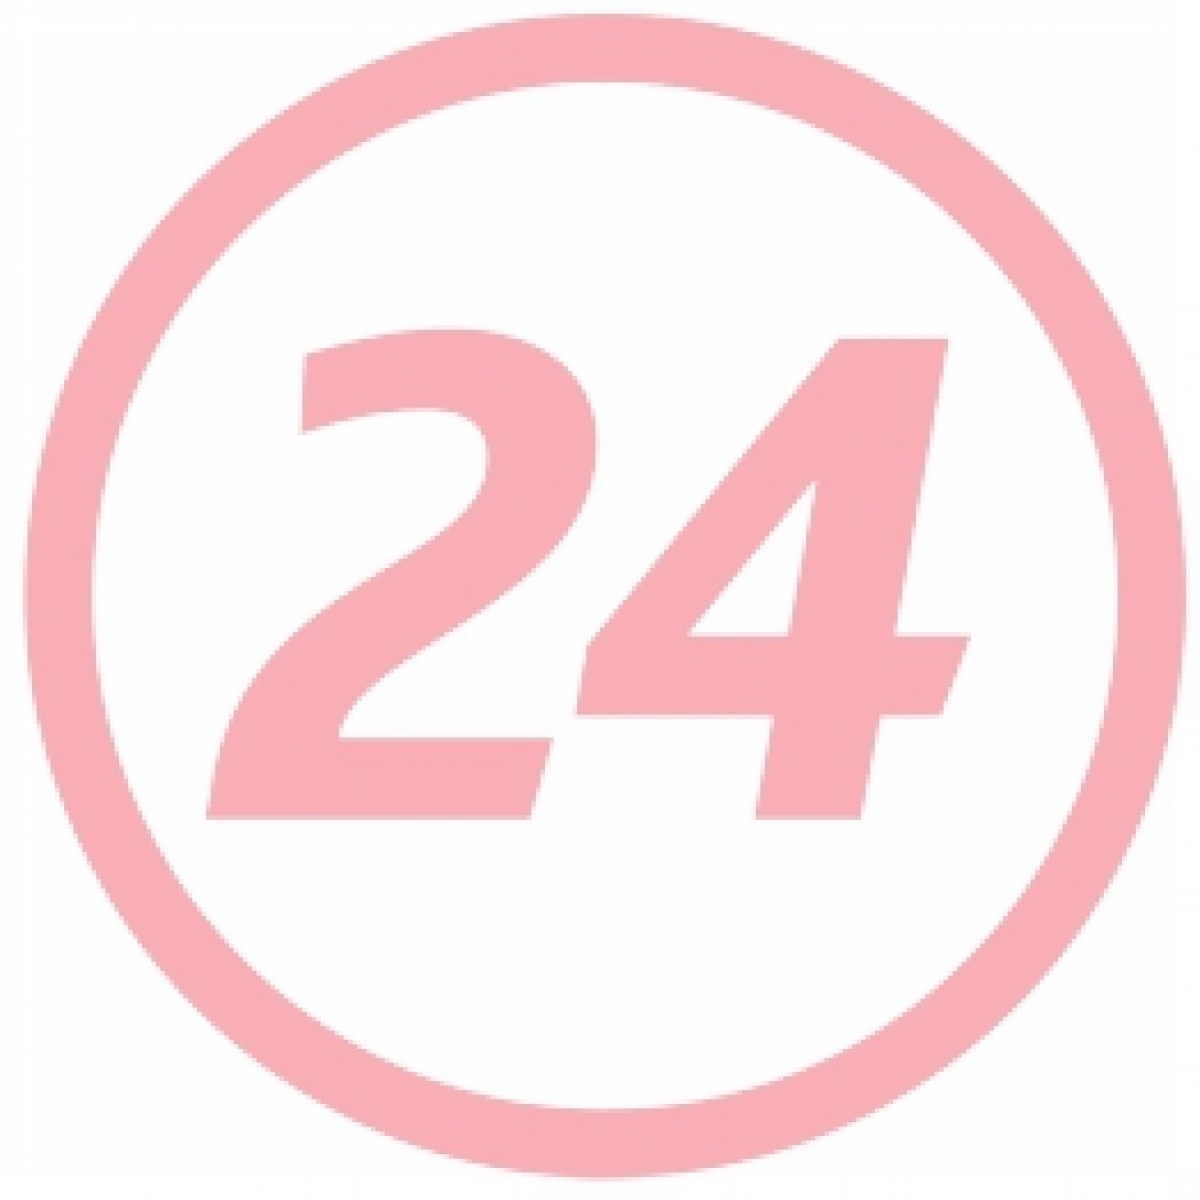 Uractiv 21Intimate Wash Gel Intim, Gel , 75ml